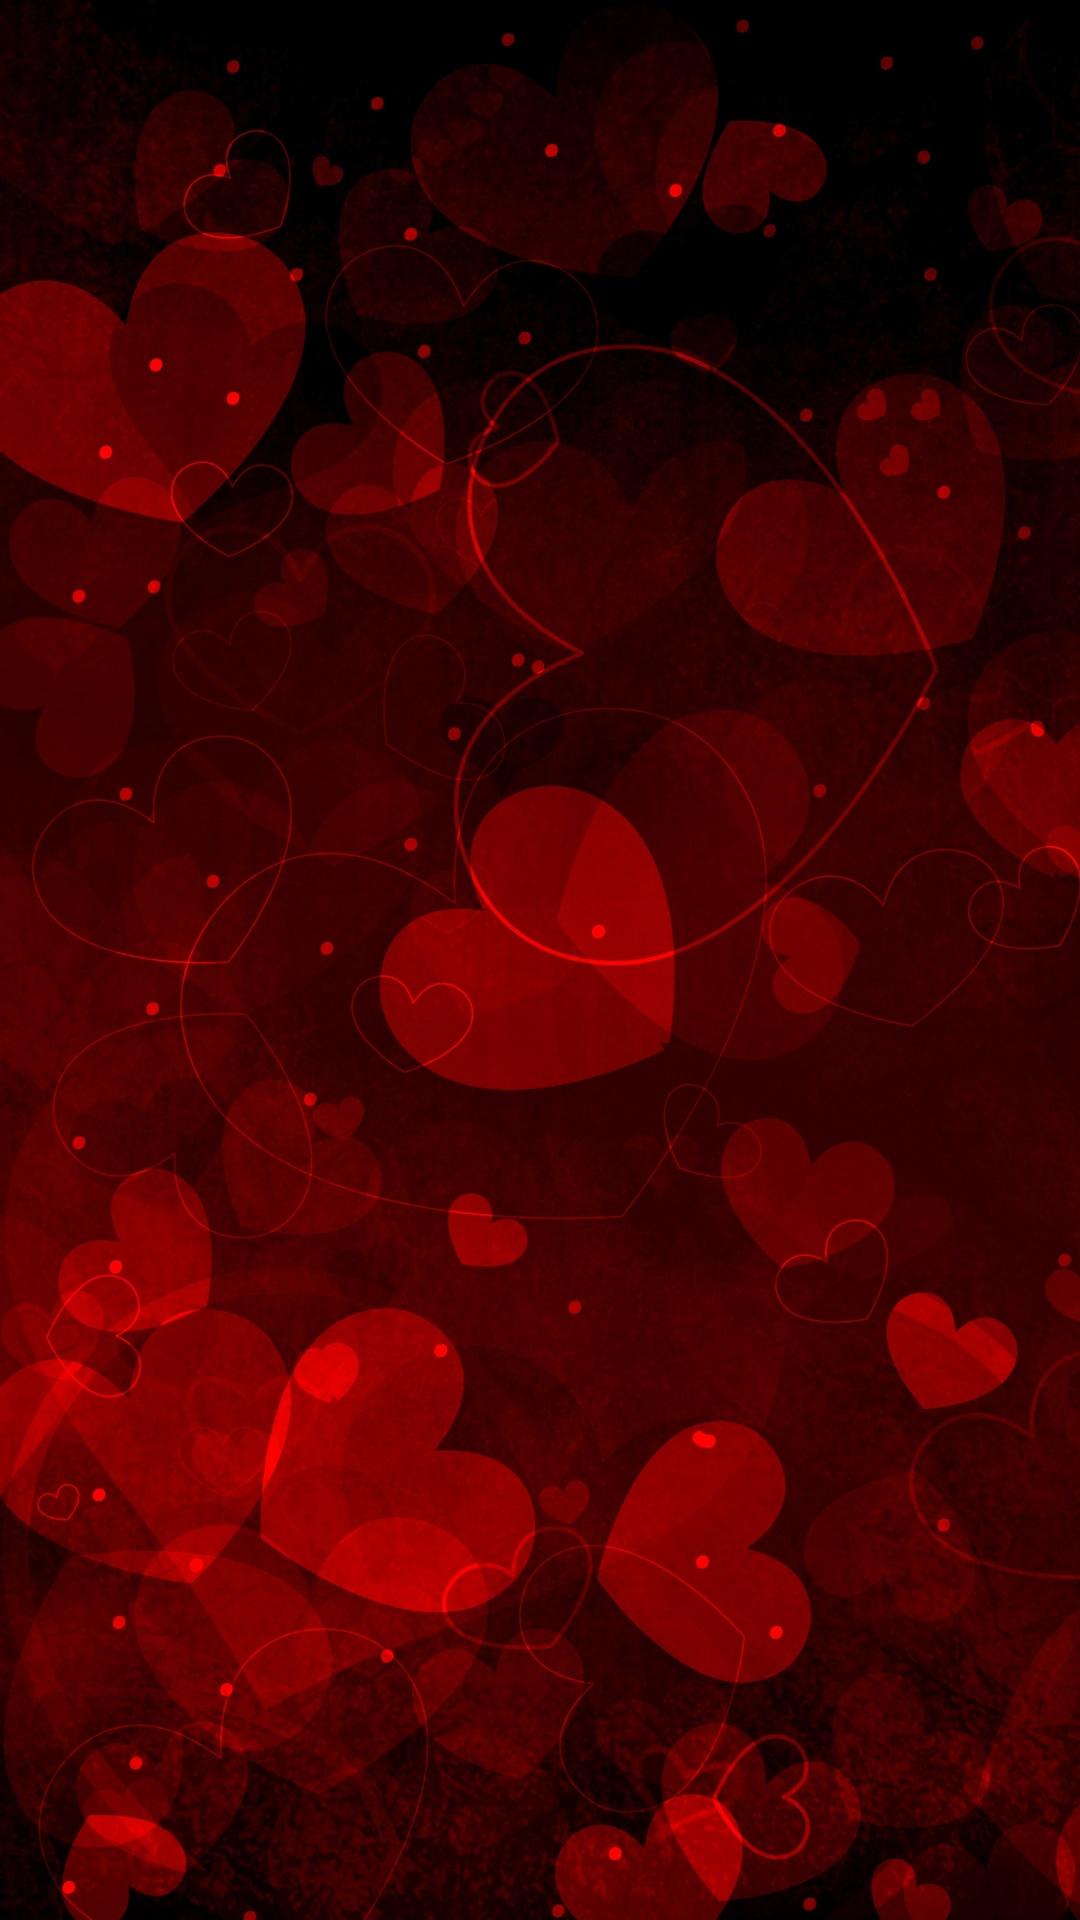 Iphone Full Screen Heart Wallpaper Hd